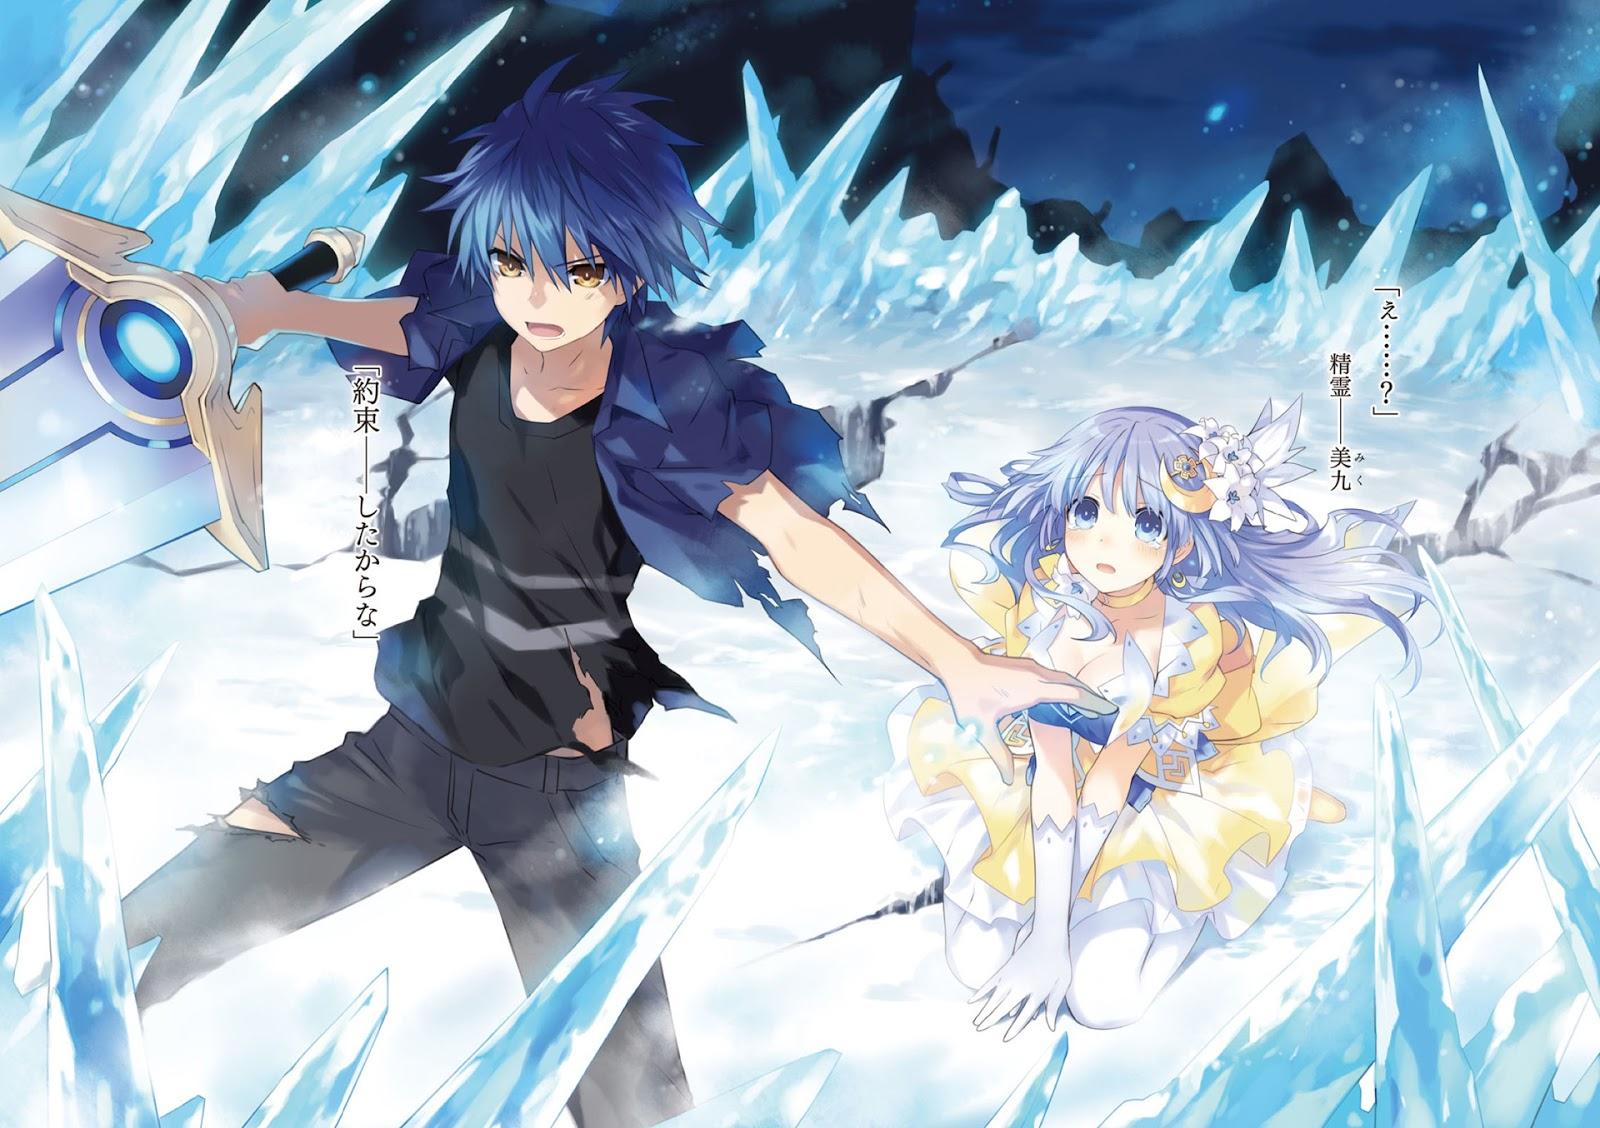 Date A Live Shido Itsuka Miku Izayoi Anime Sword Ice Frozen Field HD 1600x1128